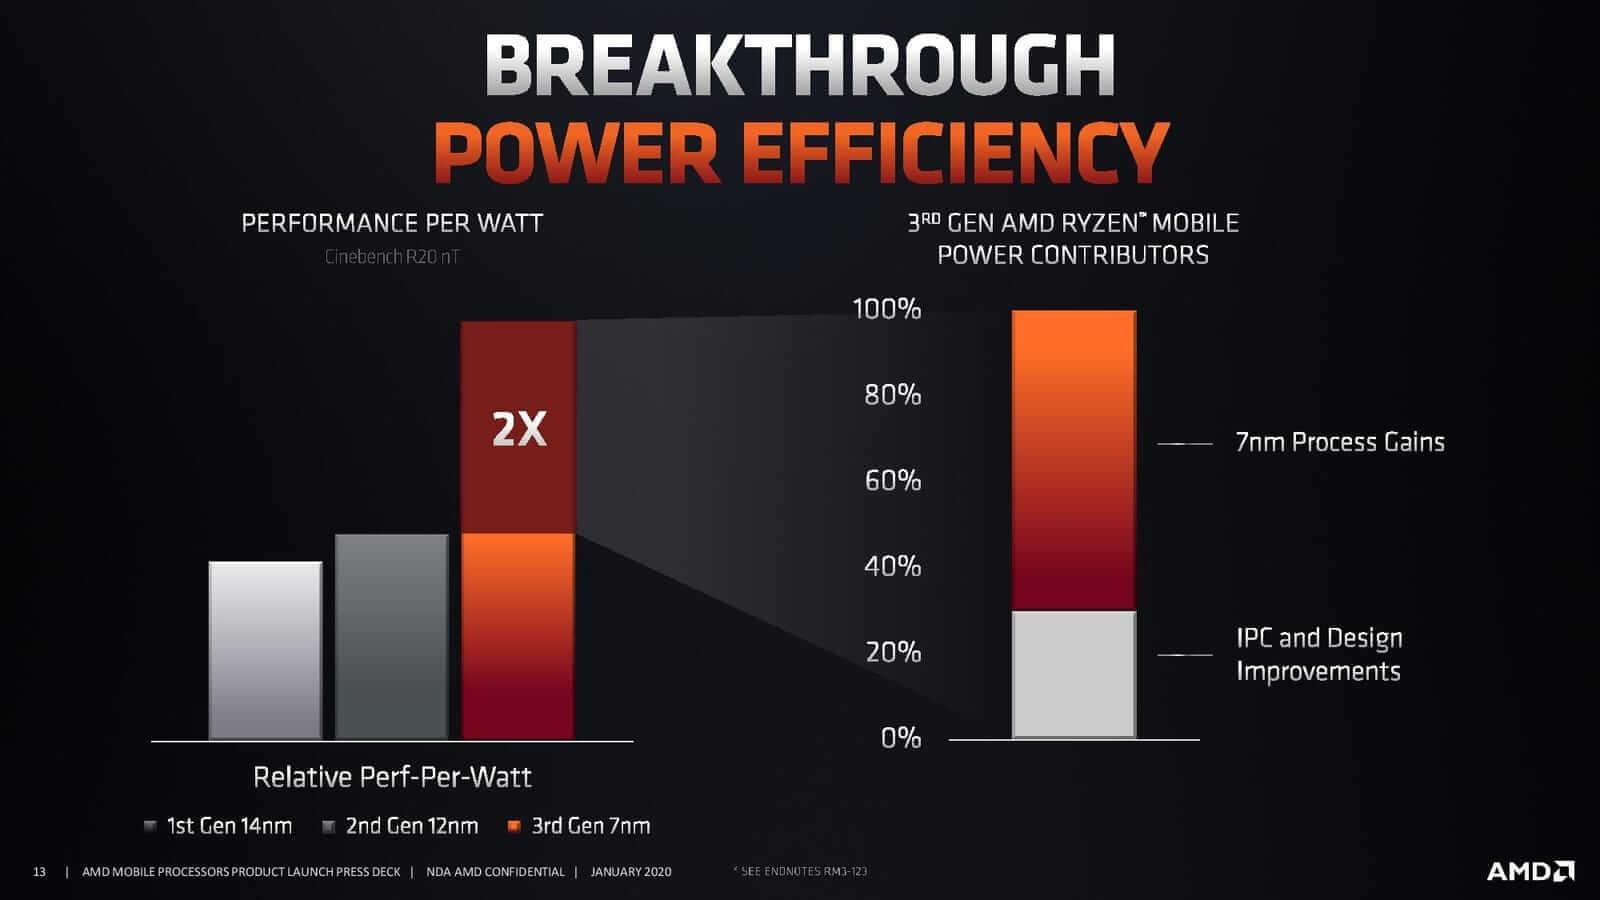 How AMD achieved 2x Performance Per Watt